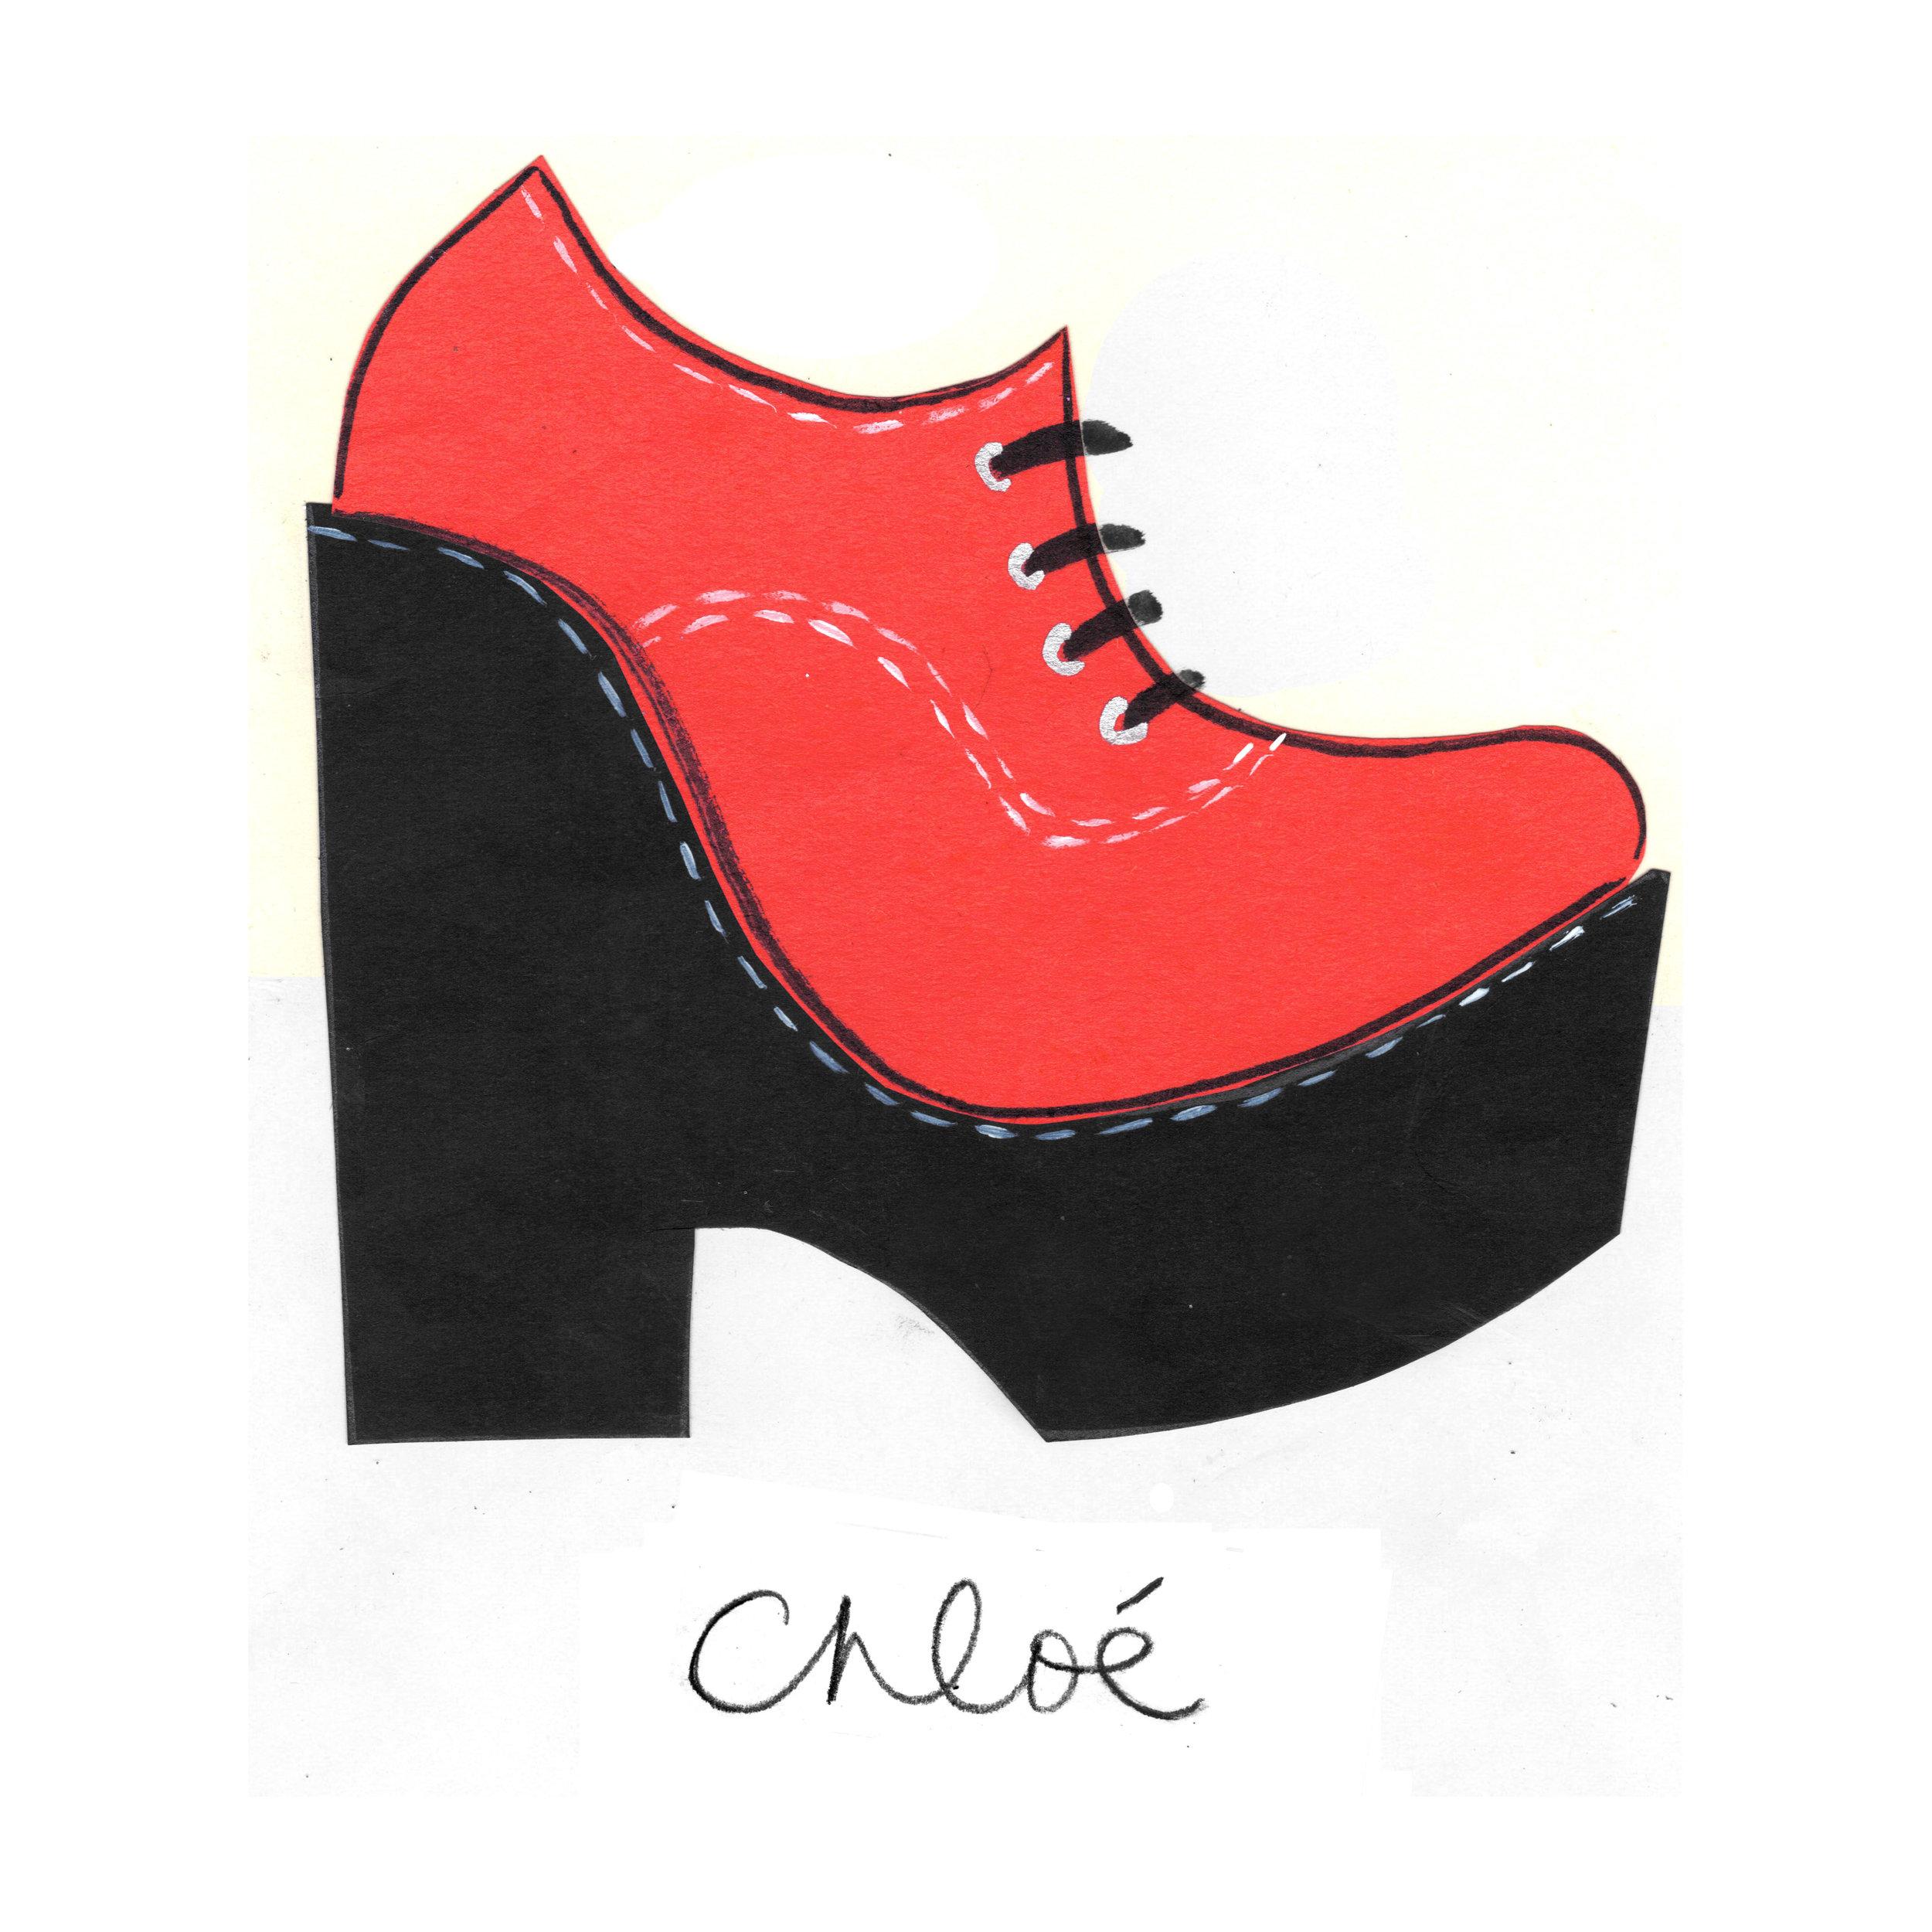 shoes_chloe_doc_final.jpg